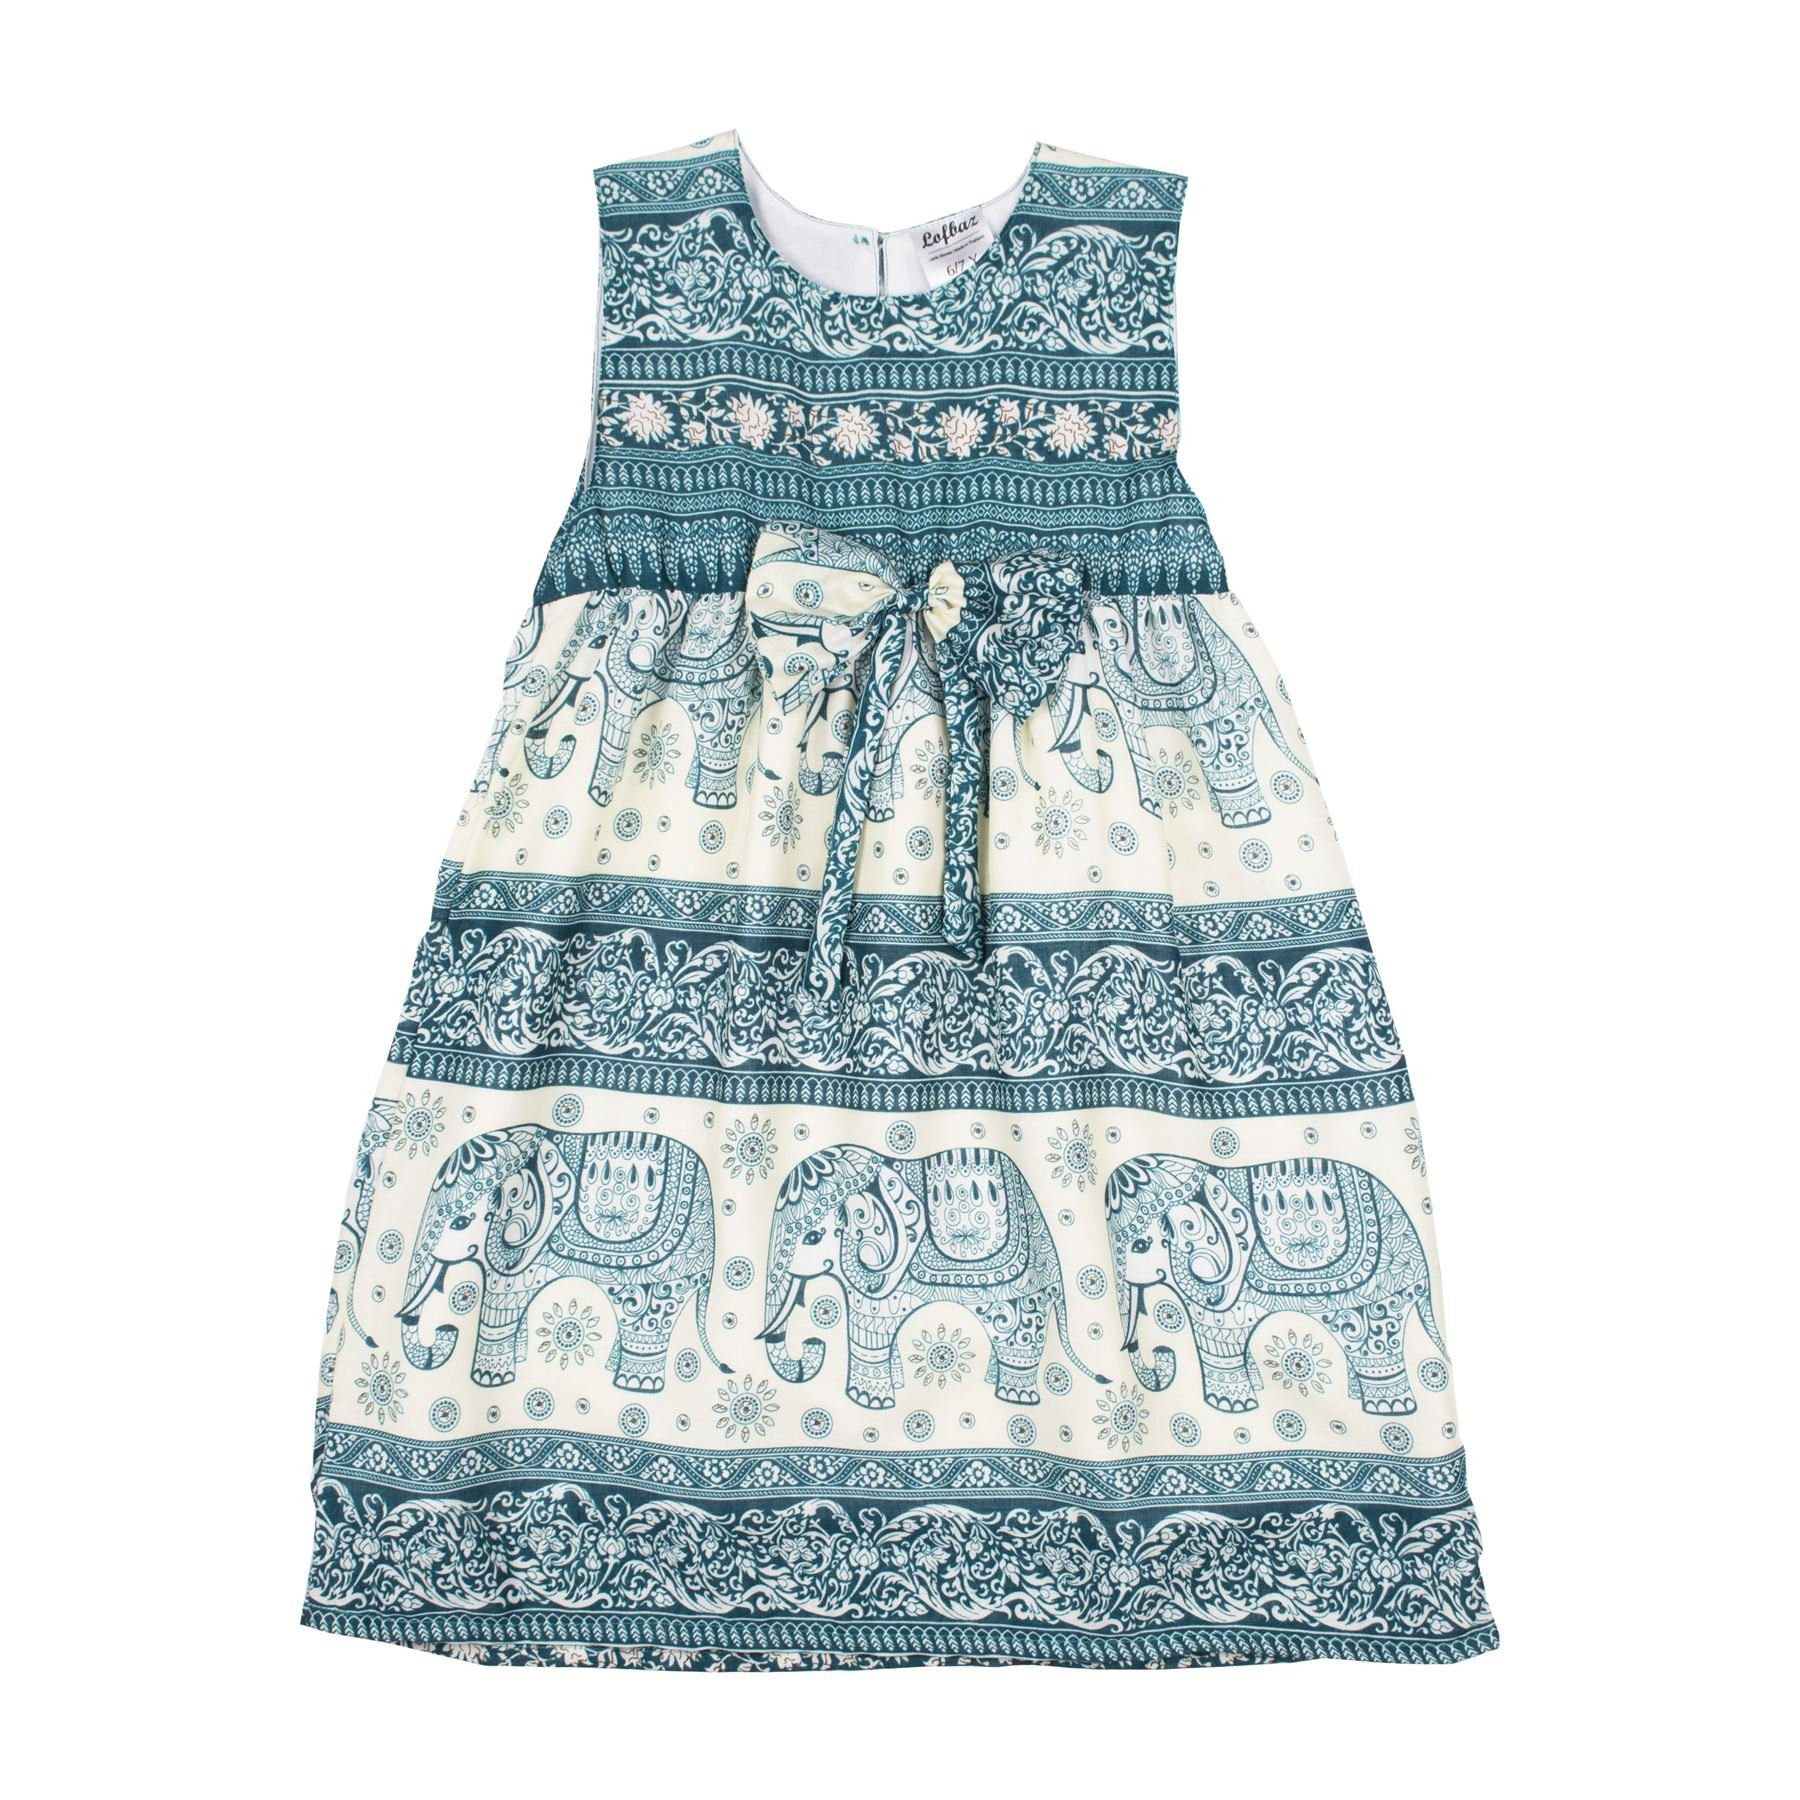 Lofbaz Girls Printed Rayon Sleeveless Tea Dresses Peacock 1 Teal Green 5/6Y